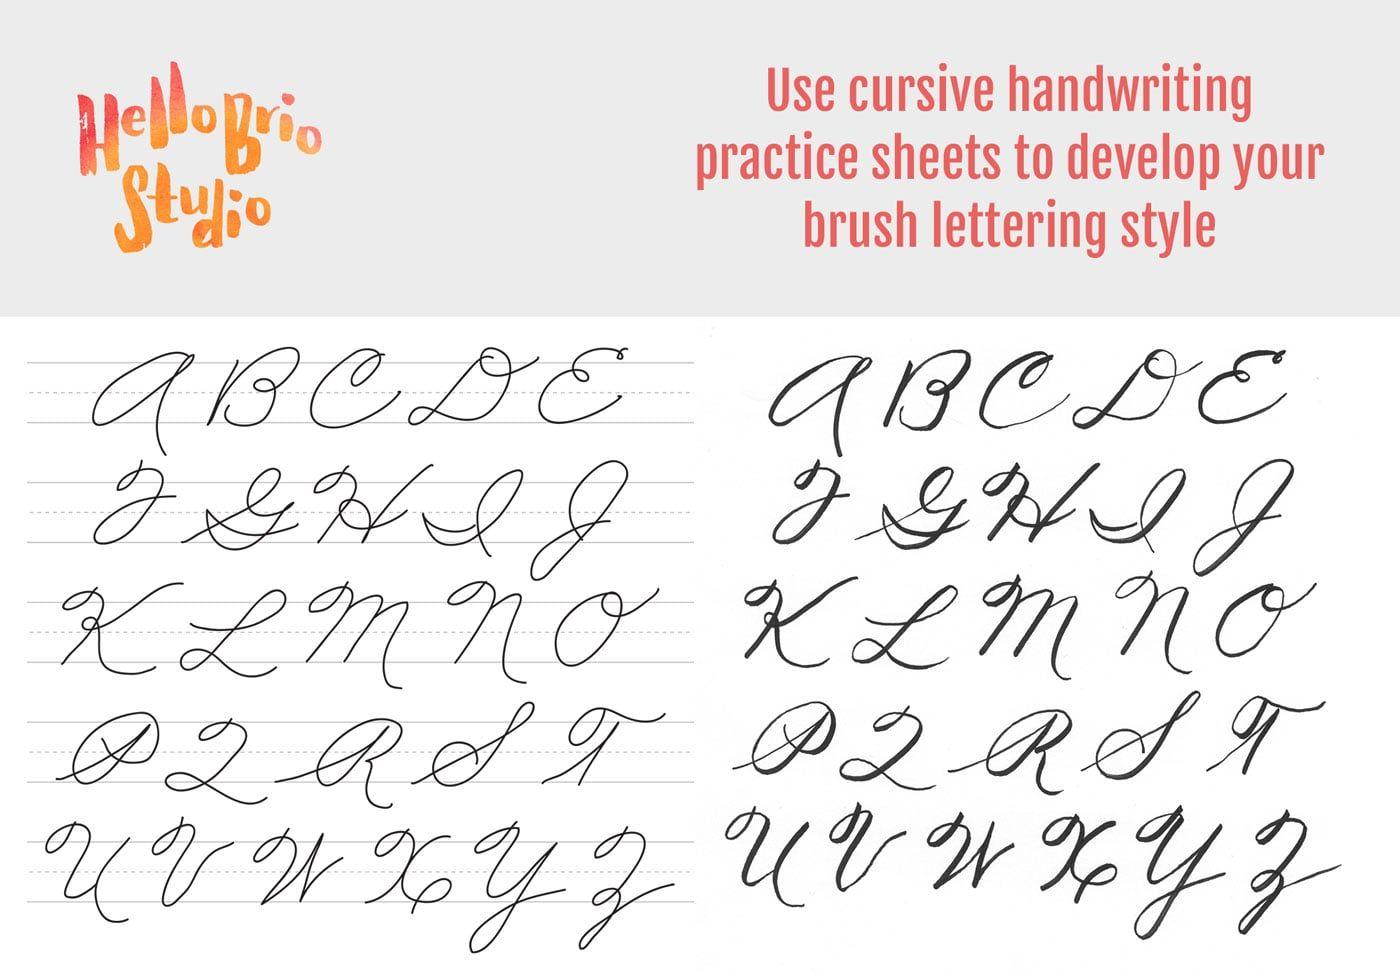 Workbooks zaner bloser cursive worksheets : Calligraphy Cursive Worksheets - lower case cursive worksheets ...